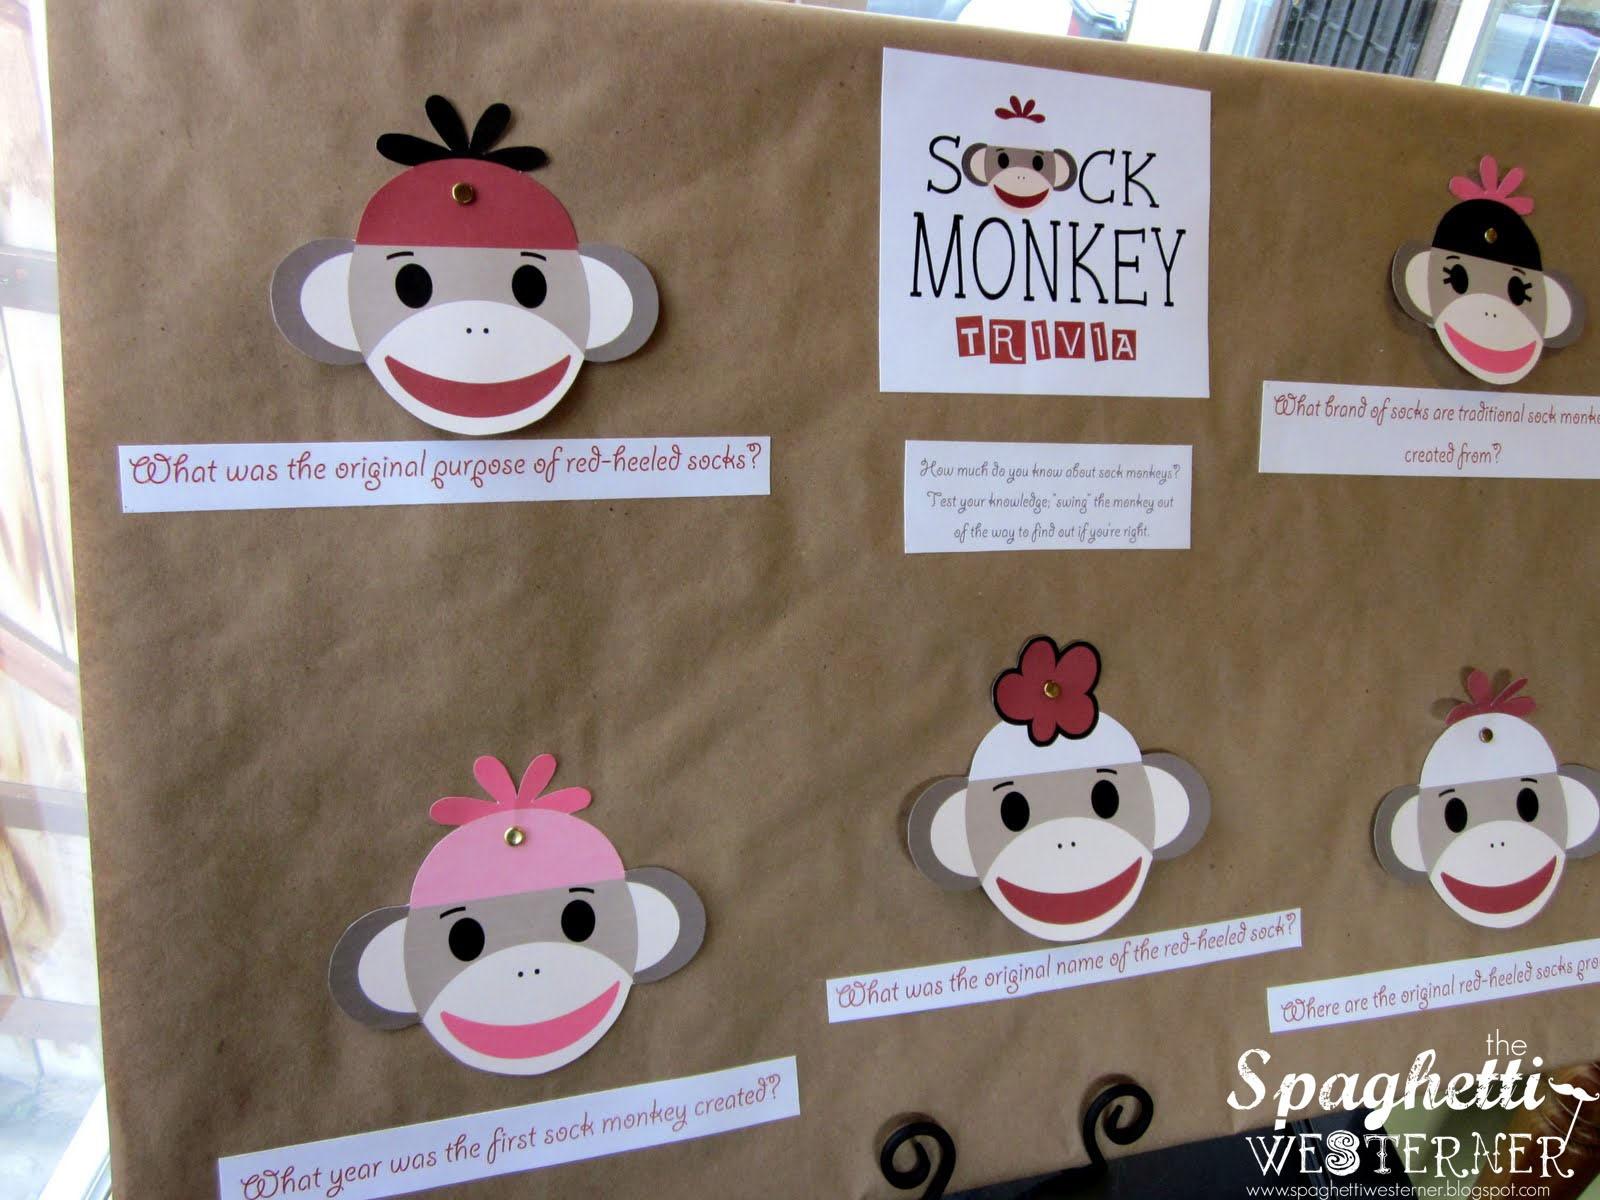 Best 61+ Sock Monkey Wallpaper On Hipwallpaper | Funny Monkey - Free Printable Sock Monkey Pictures